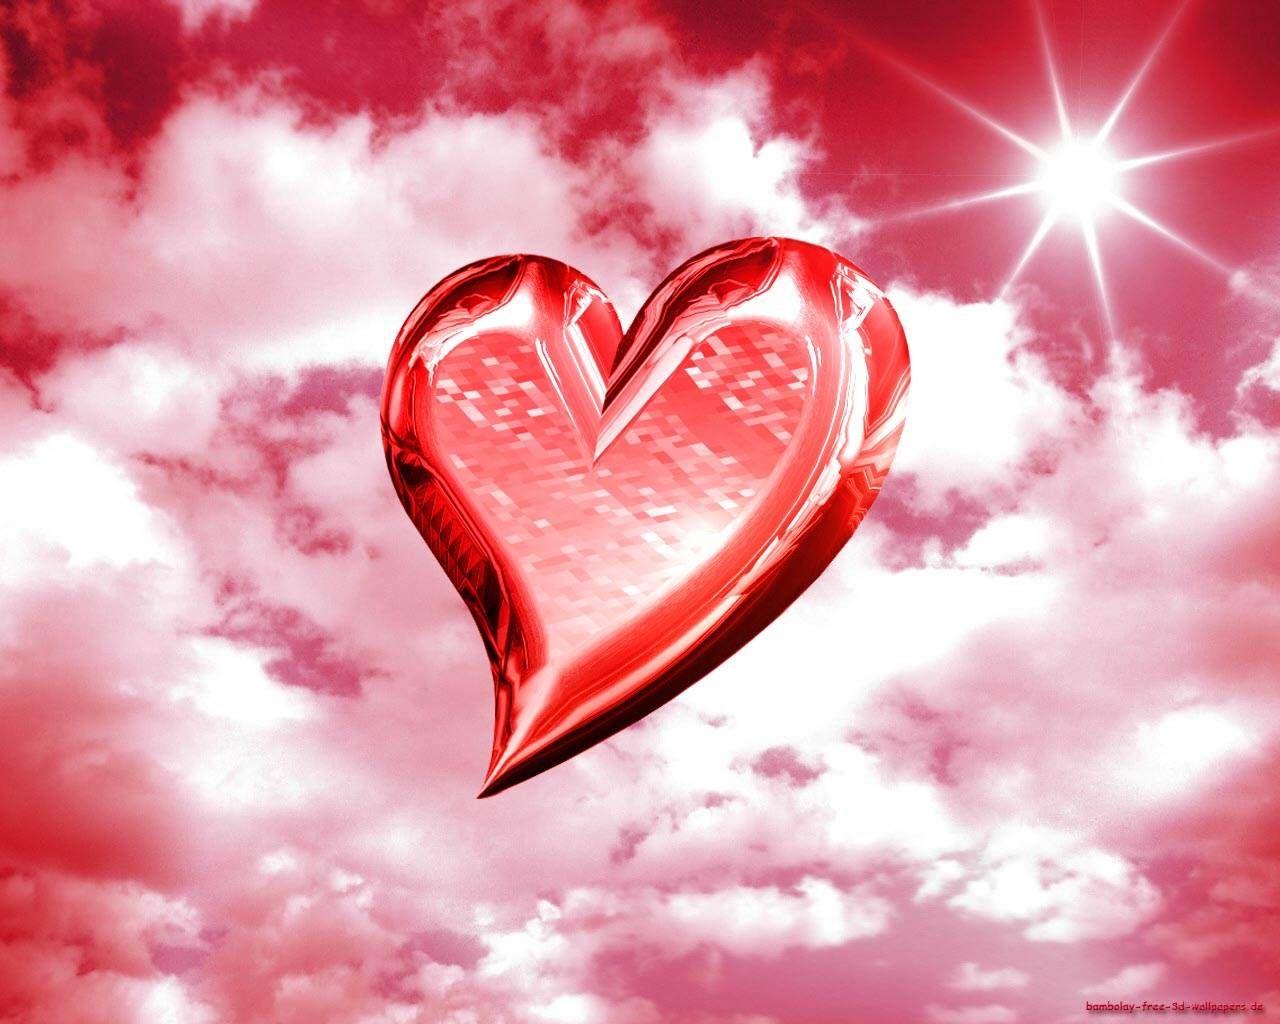 Wallpaper download new love - New Love Wallpaper Download Live Hd Wallpaper Hq Pictures 1280 1024 New Images Of Love